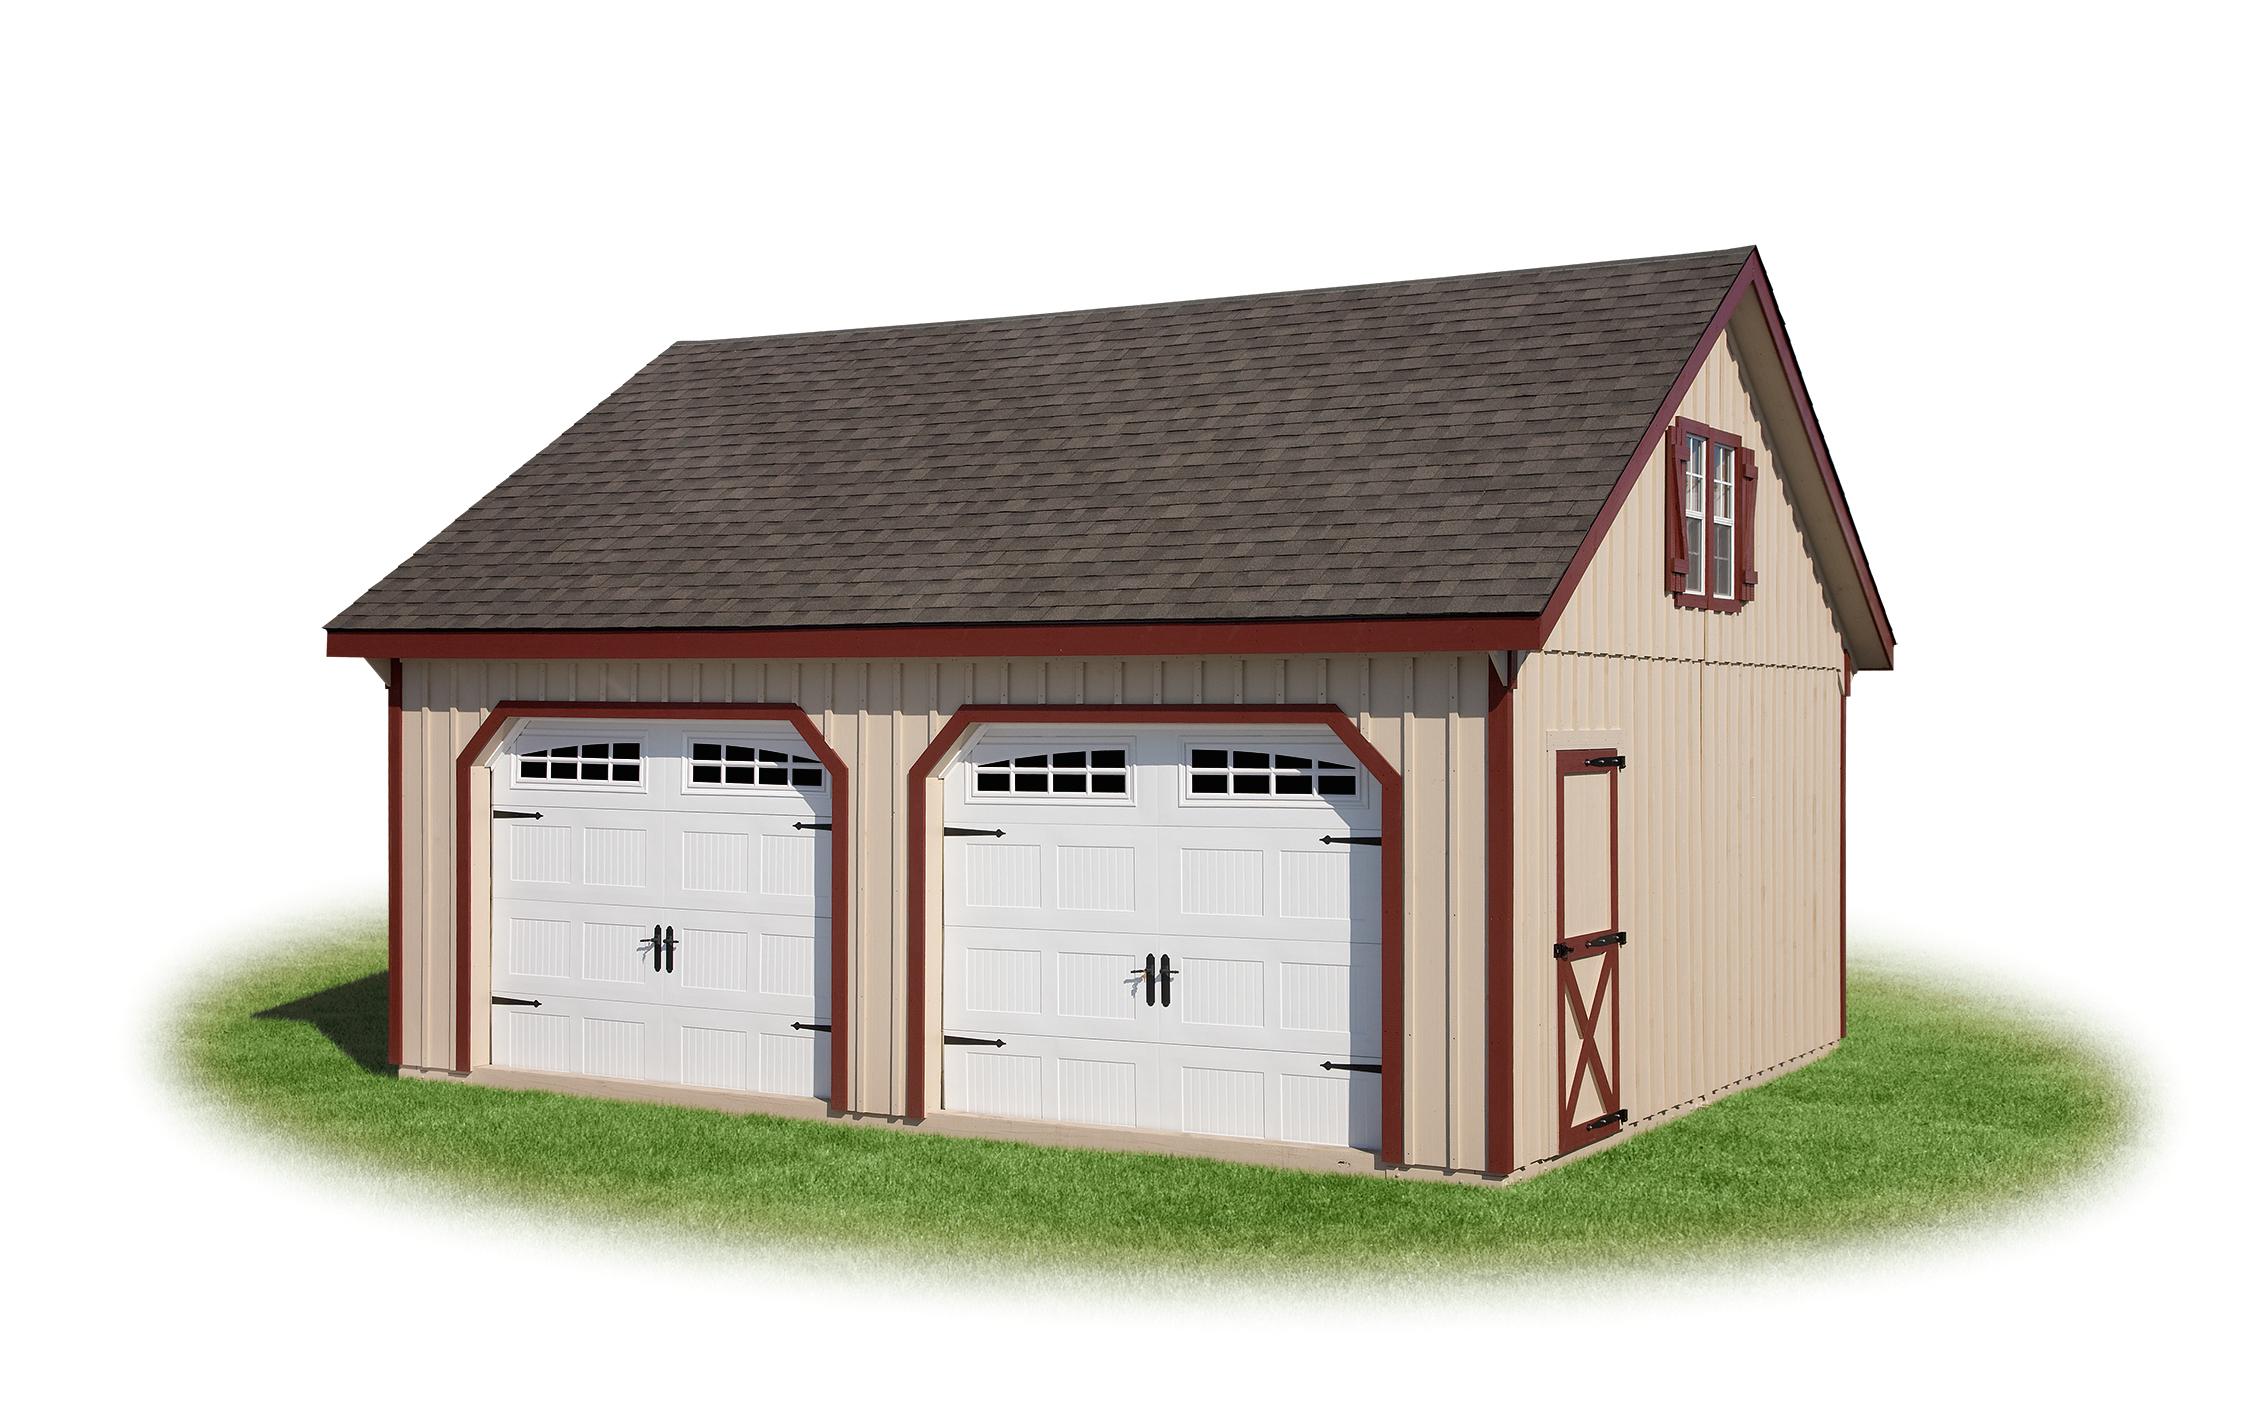 Modular garage full loft 2 for Modular garages with loft